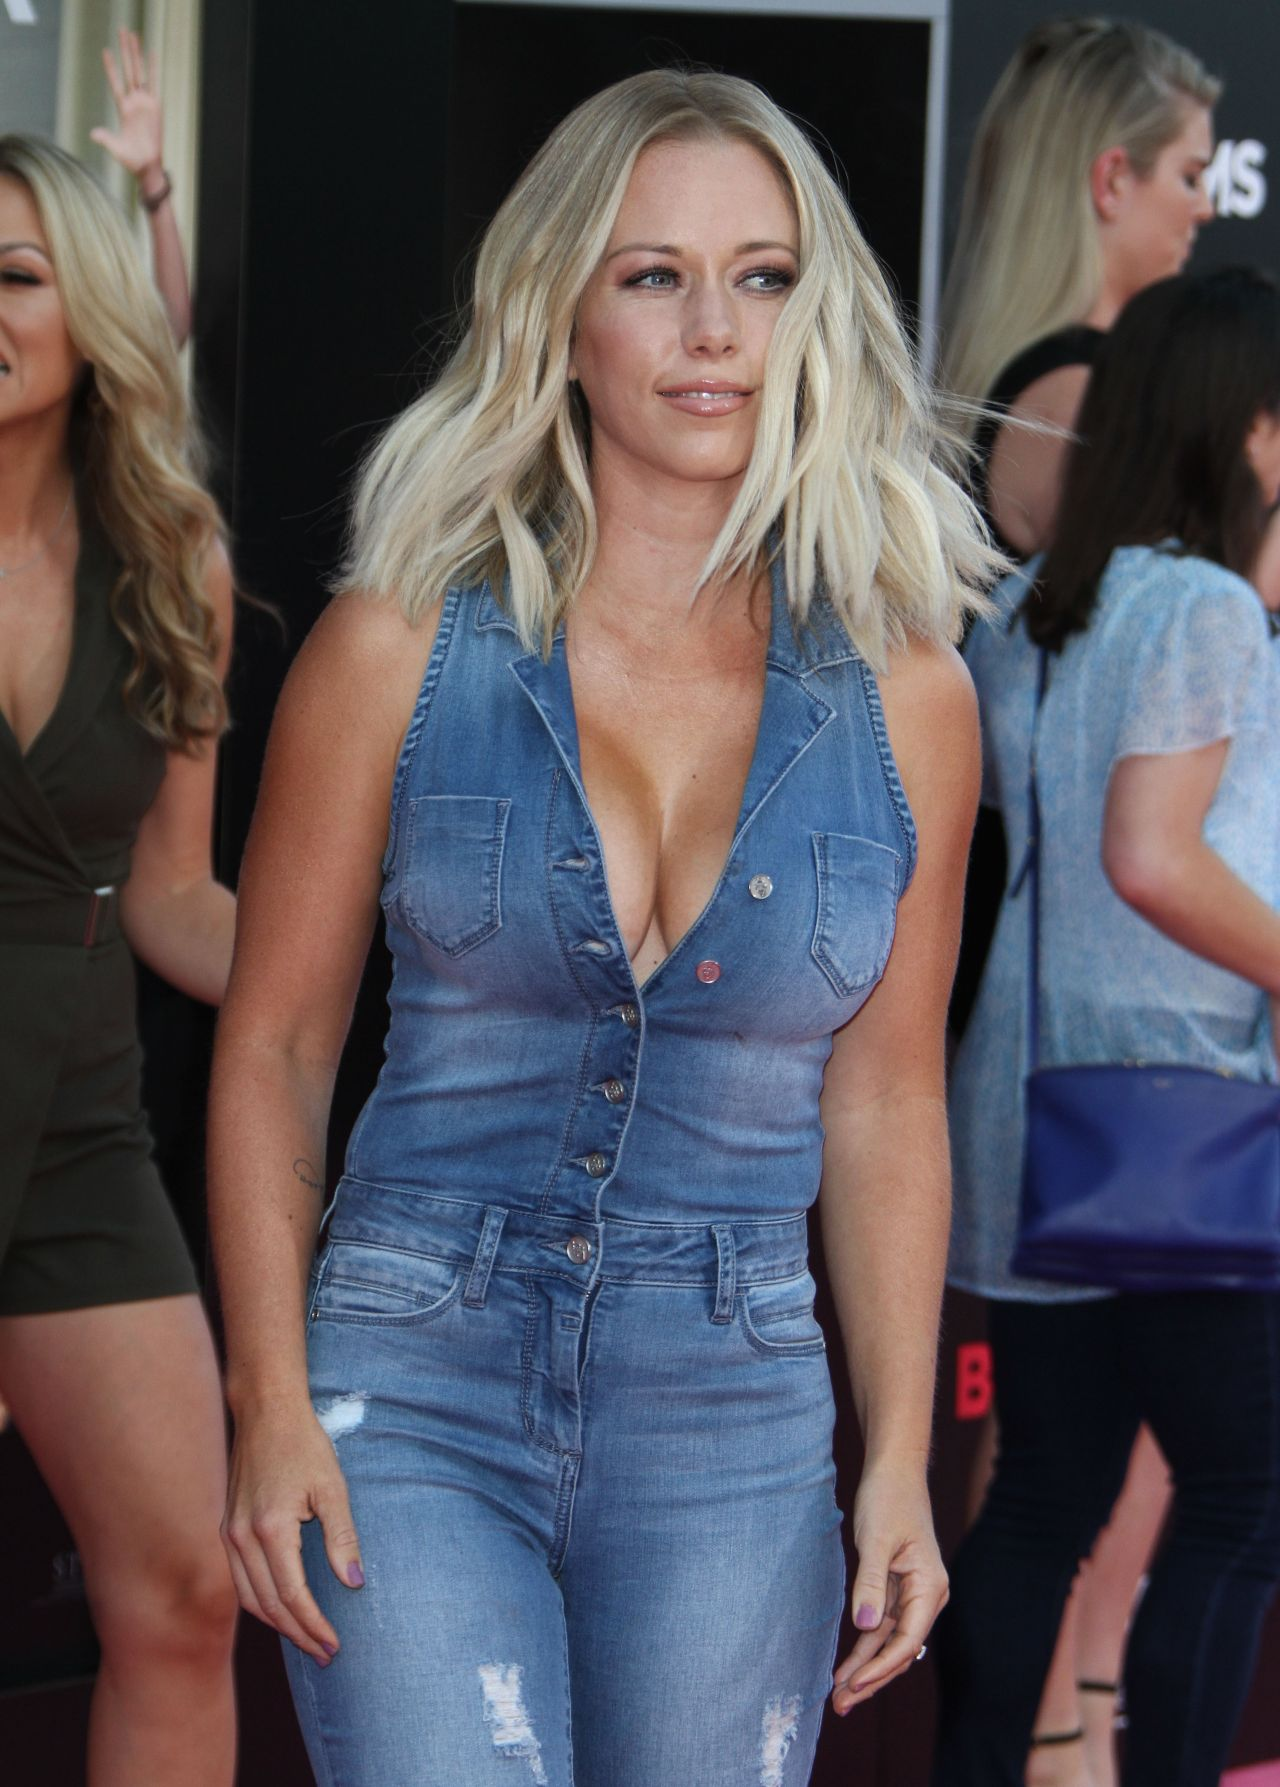 Kendra Wilkinson Bad Moms Premiere In Los Angeles